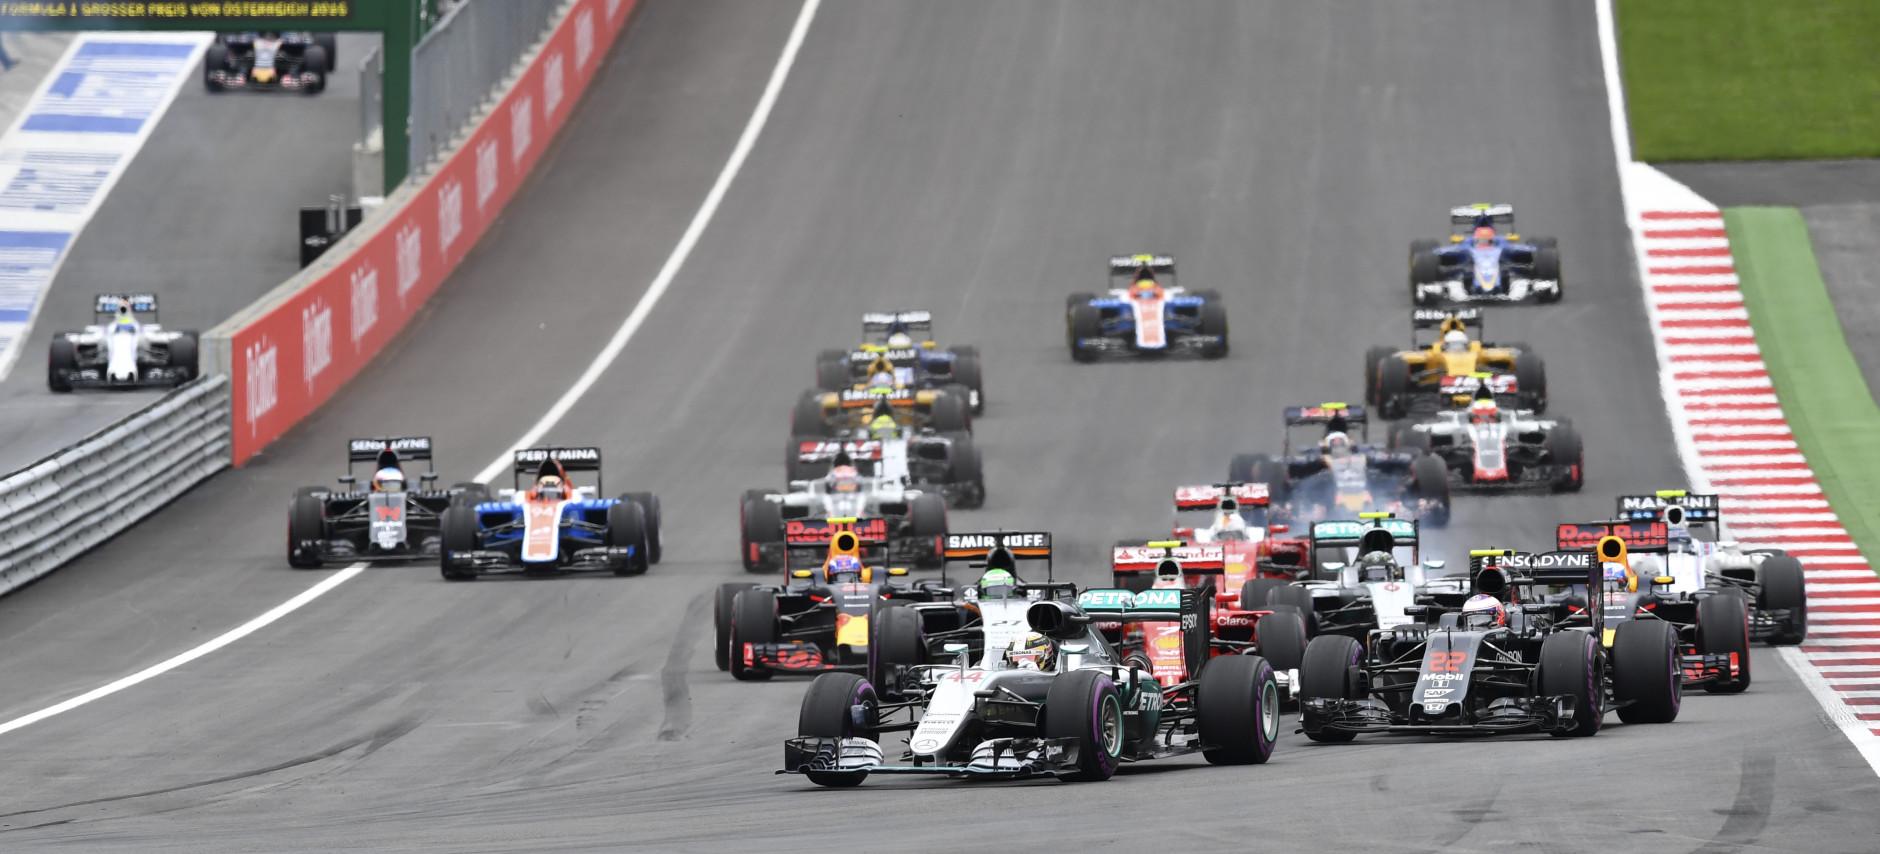 Hamilton segura a ponta. No pit-lane, Massa e Kvyat.